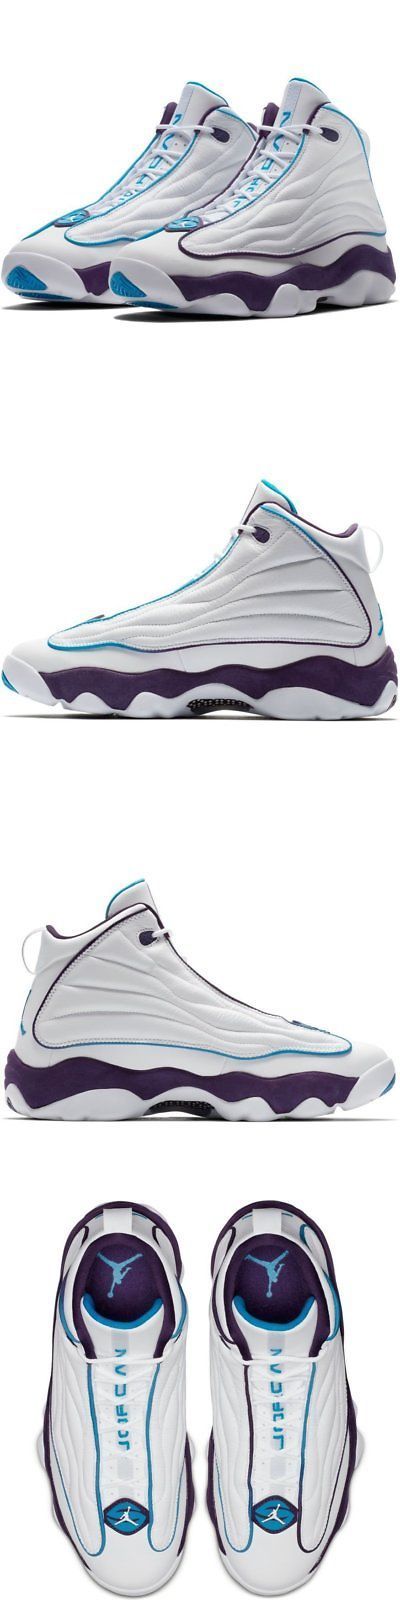 f39e123ce2e77 Athletic 15709  Men Air Jordan Pro Strong White Blue Lagoon 407285-105 -